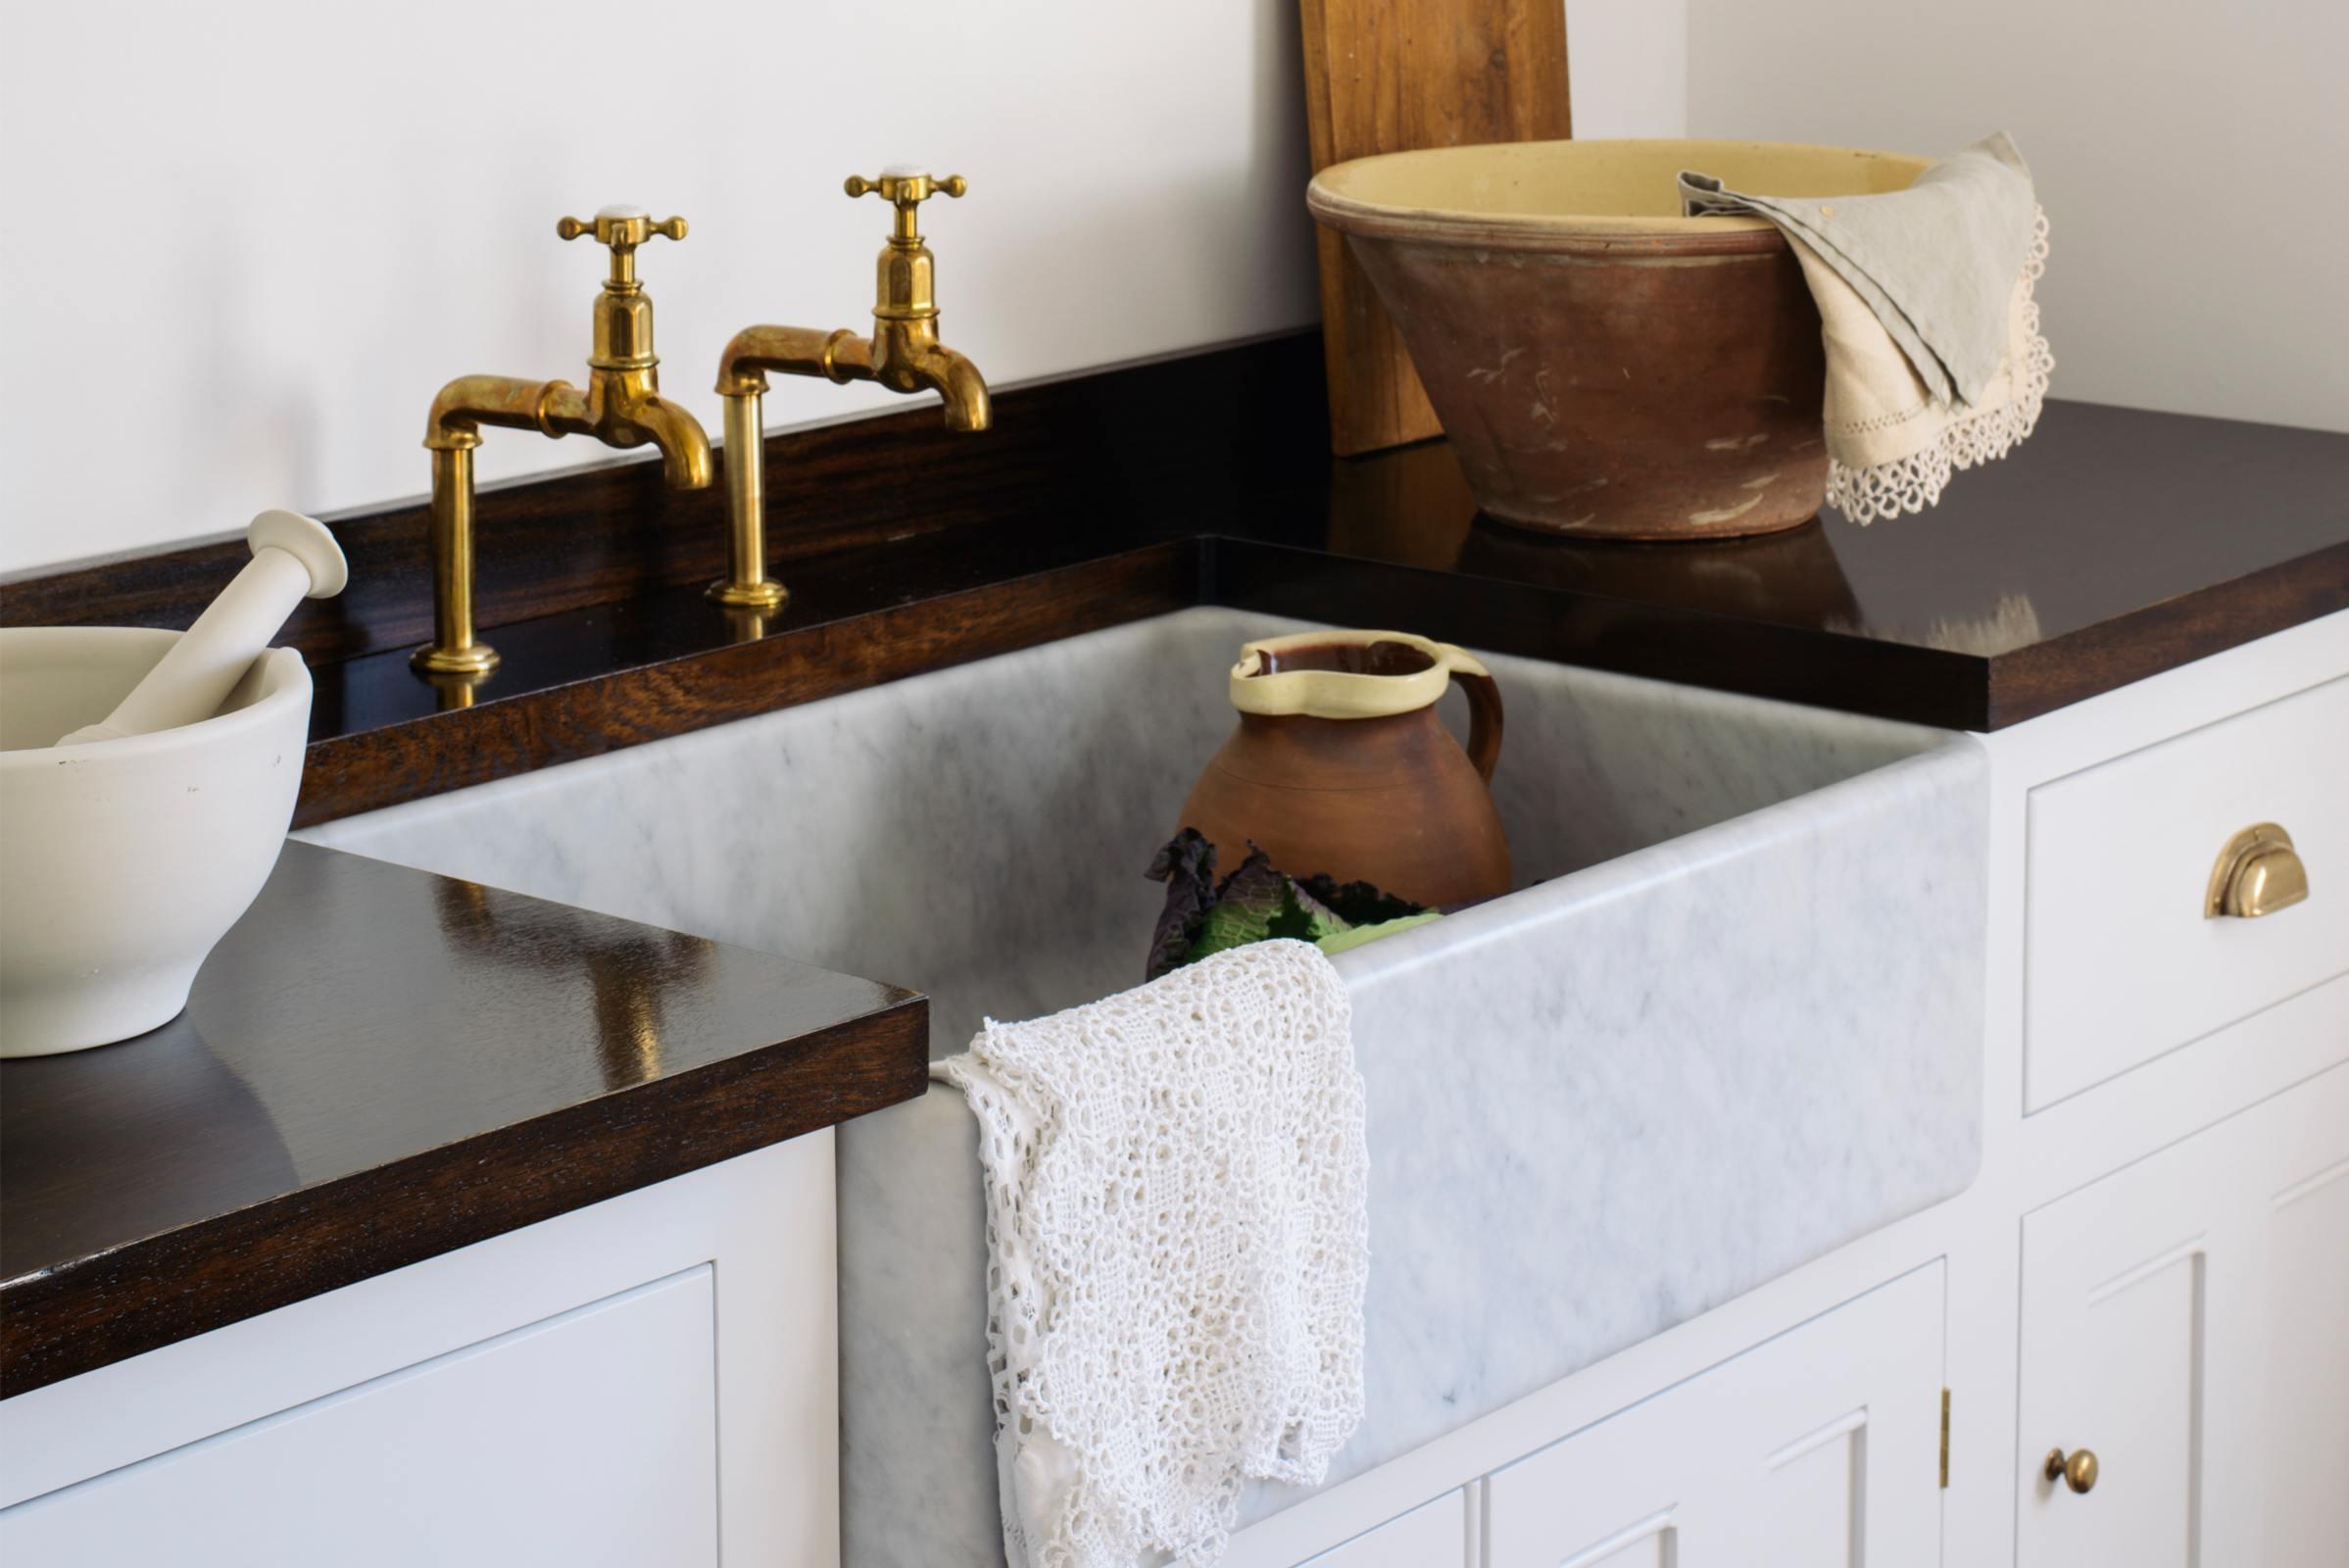 Tuscan Farmhouse 800 Single Marble Sink photo 3